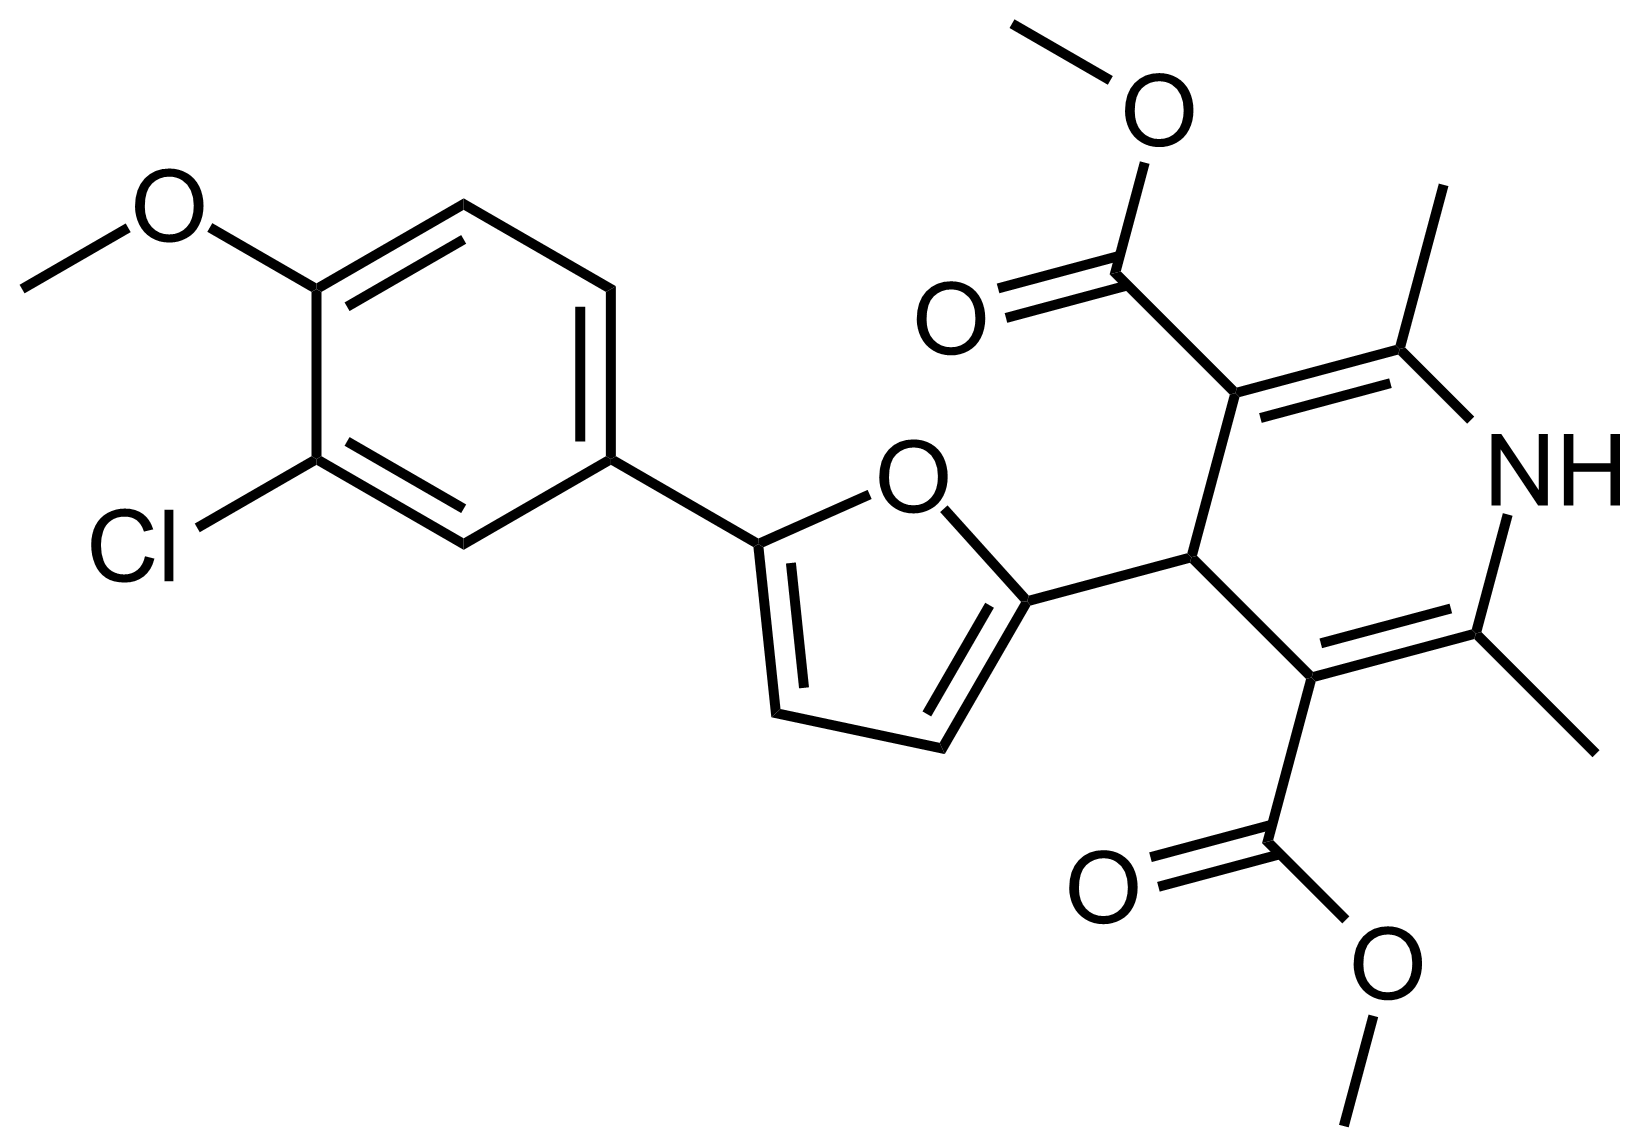 Structure of Dimethyl 4-(5-(3-chloro-4-methoxyphenyl)furan-2-yl)-2,6-dimethyl-1,4-dihydropyridine-3,5-dicarboxylate